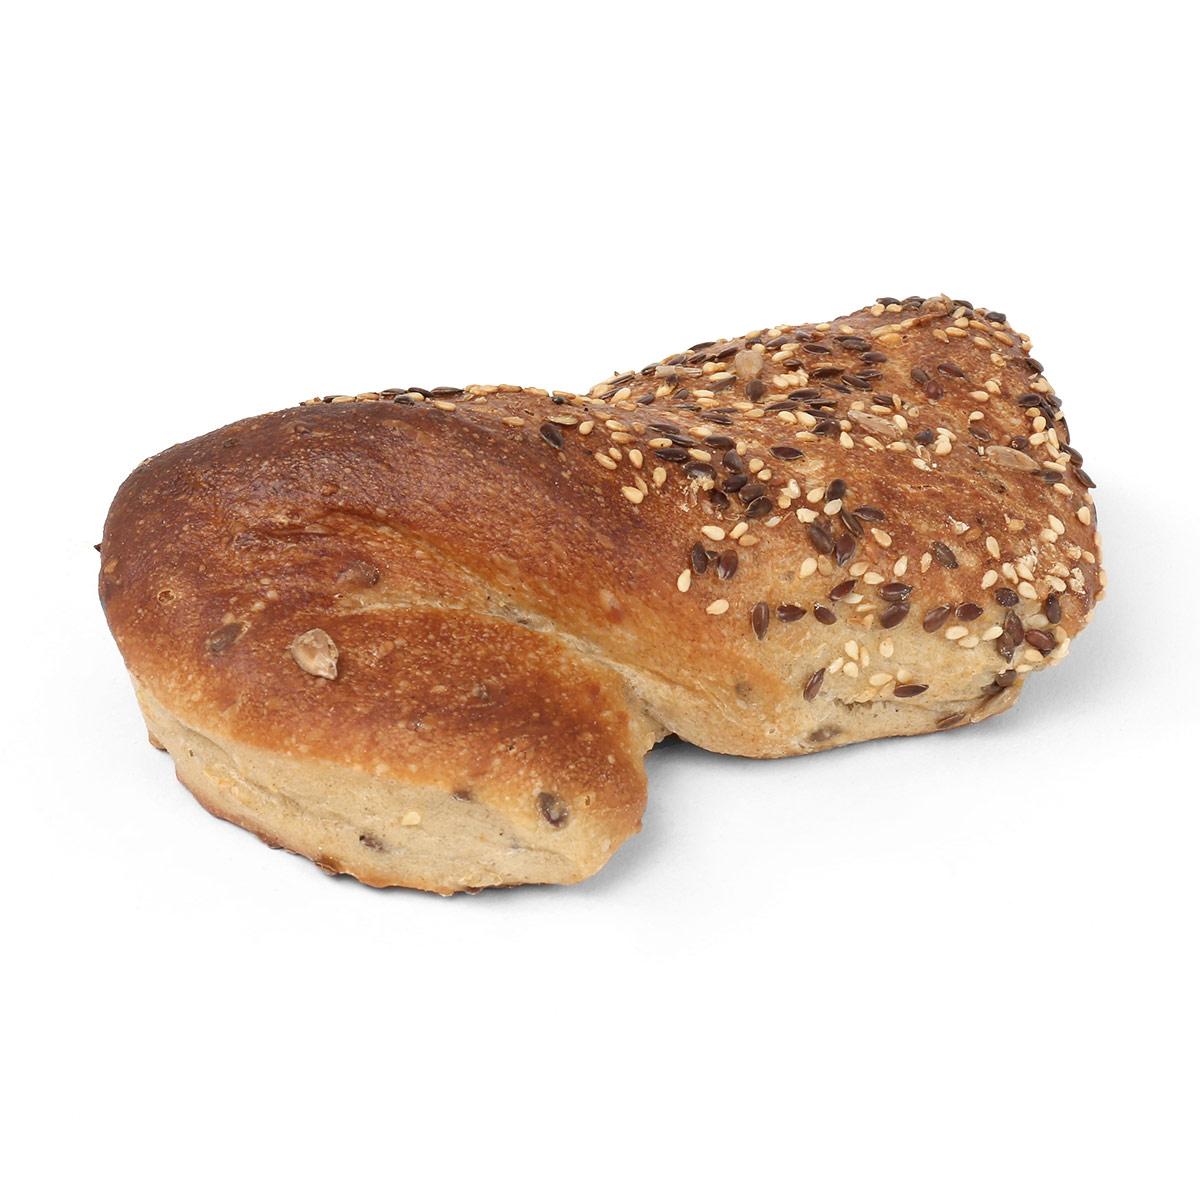 Bäckerei Kuhn Chnurzellandbrötli